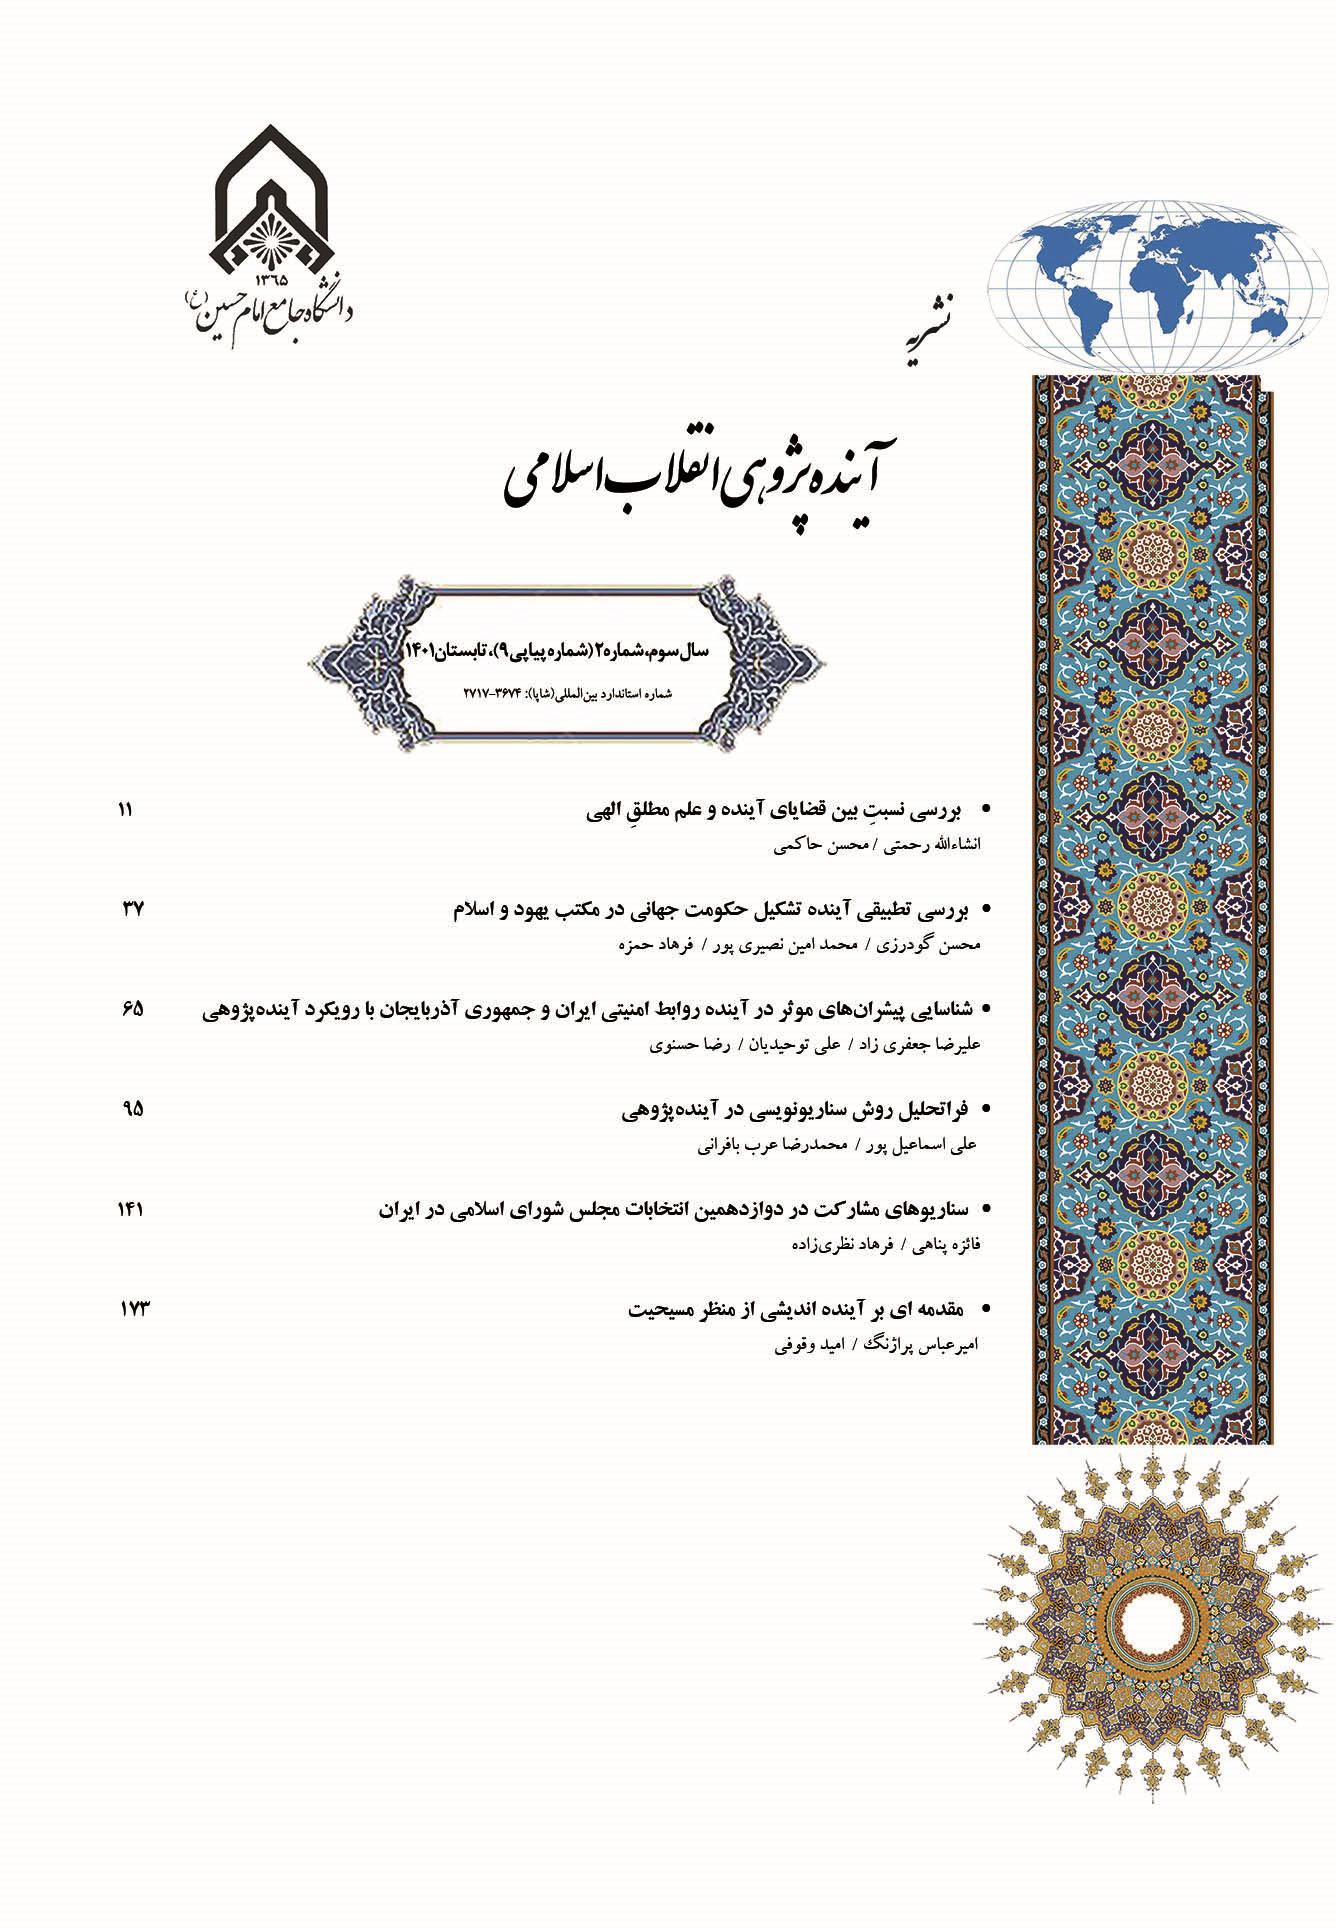 آینده پژوهی انقلاب اسلامی